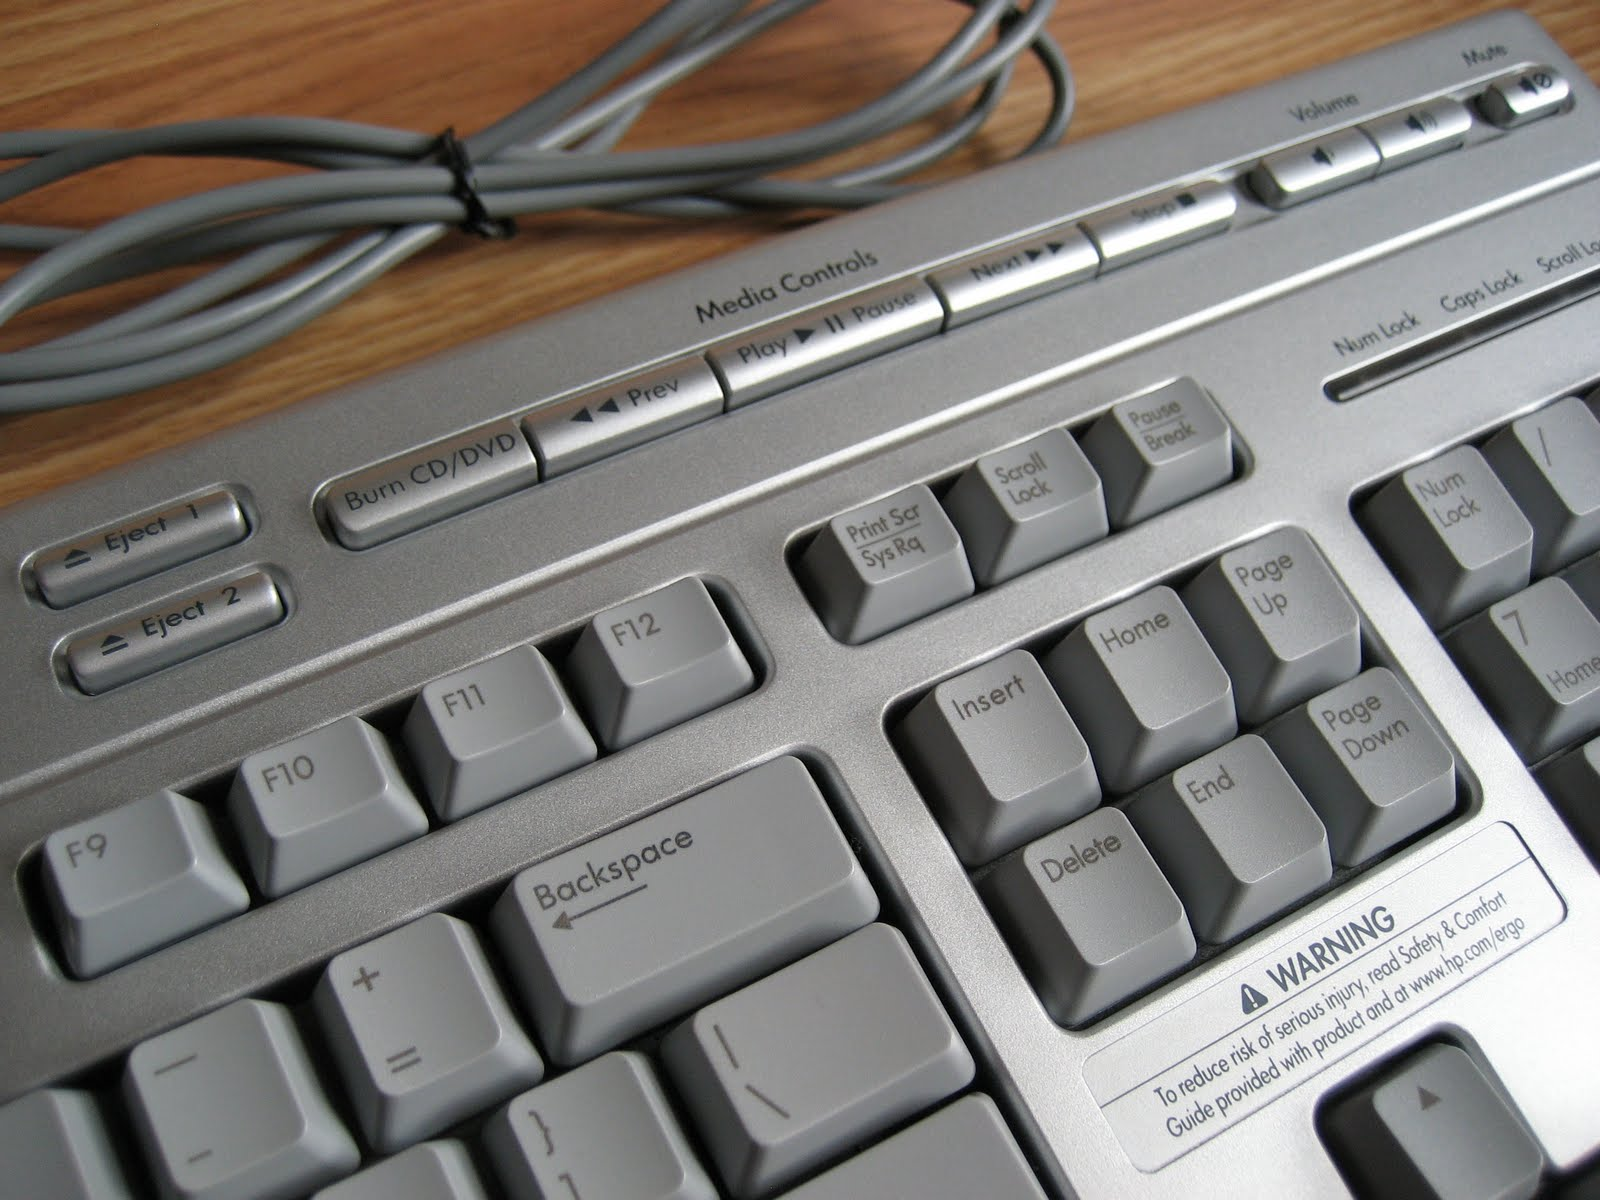 noboxtospeakof ( no box to speak of ): HP Multimedia Keyboard with Media Play 5187-7583